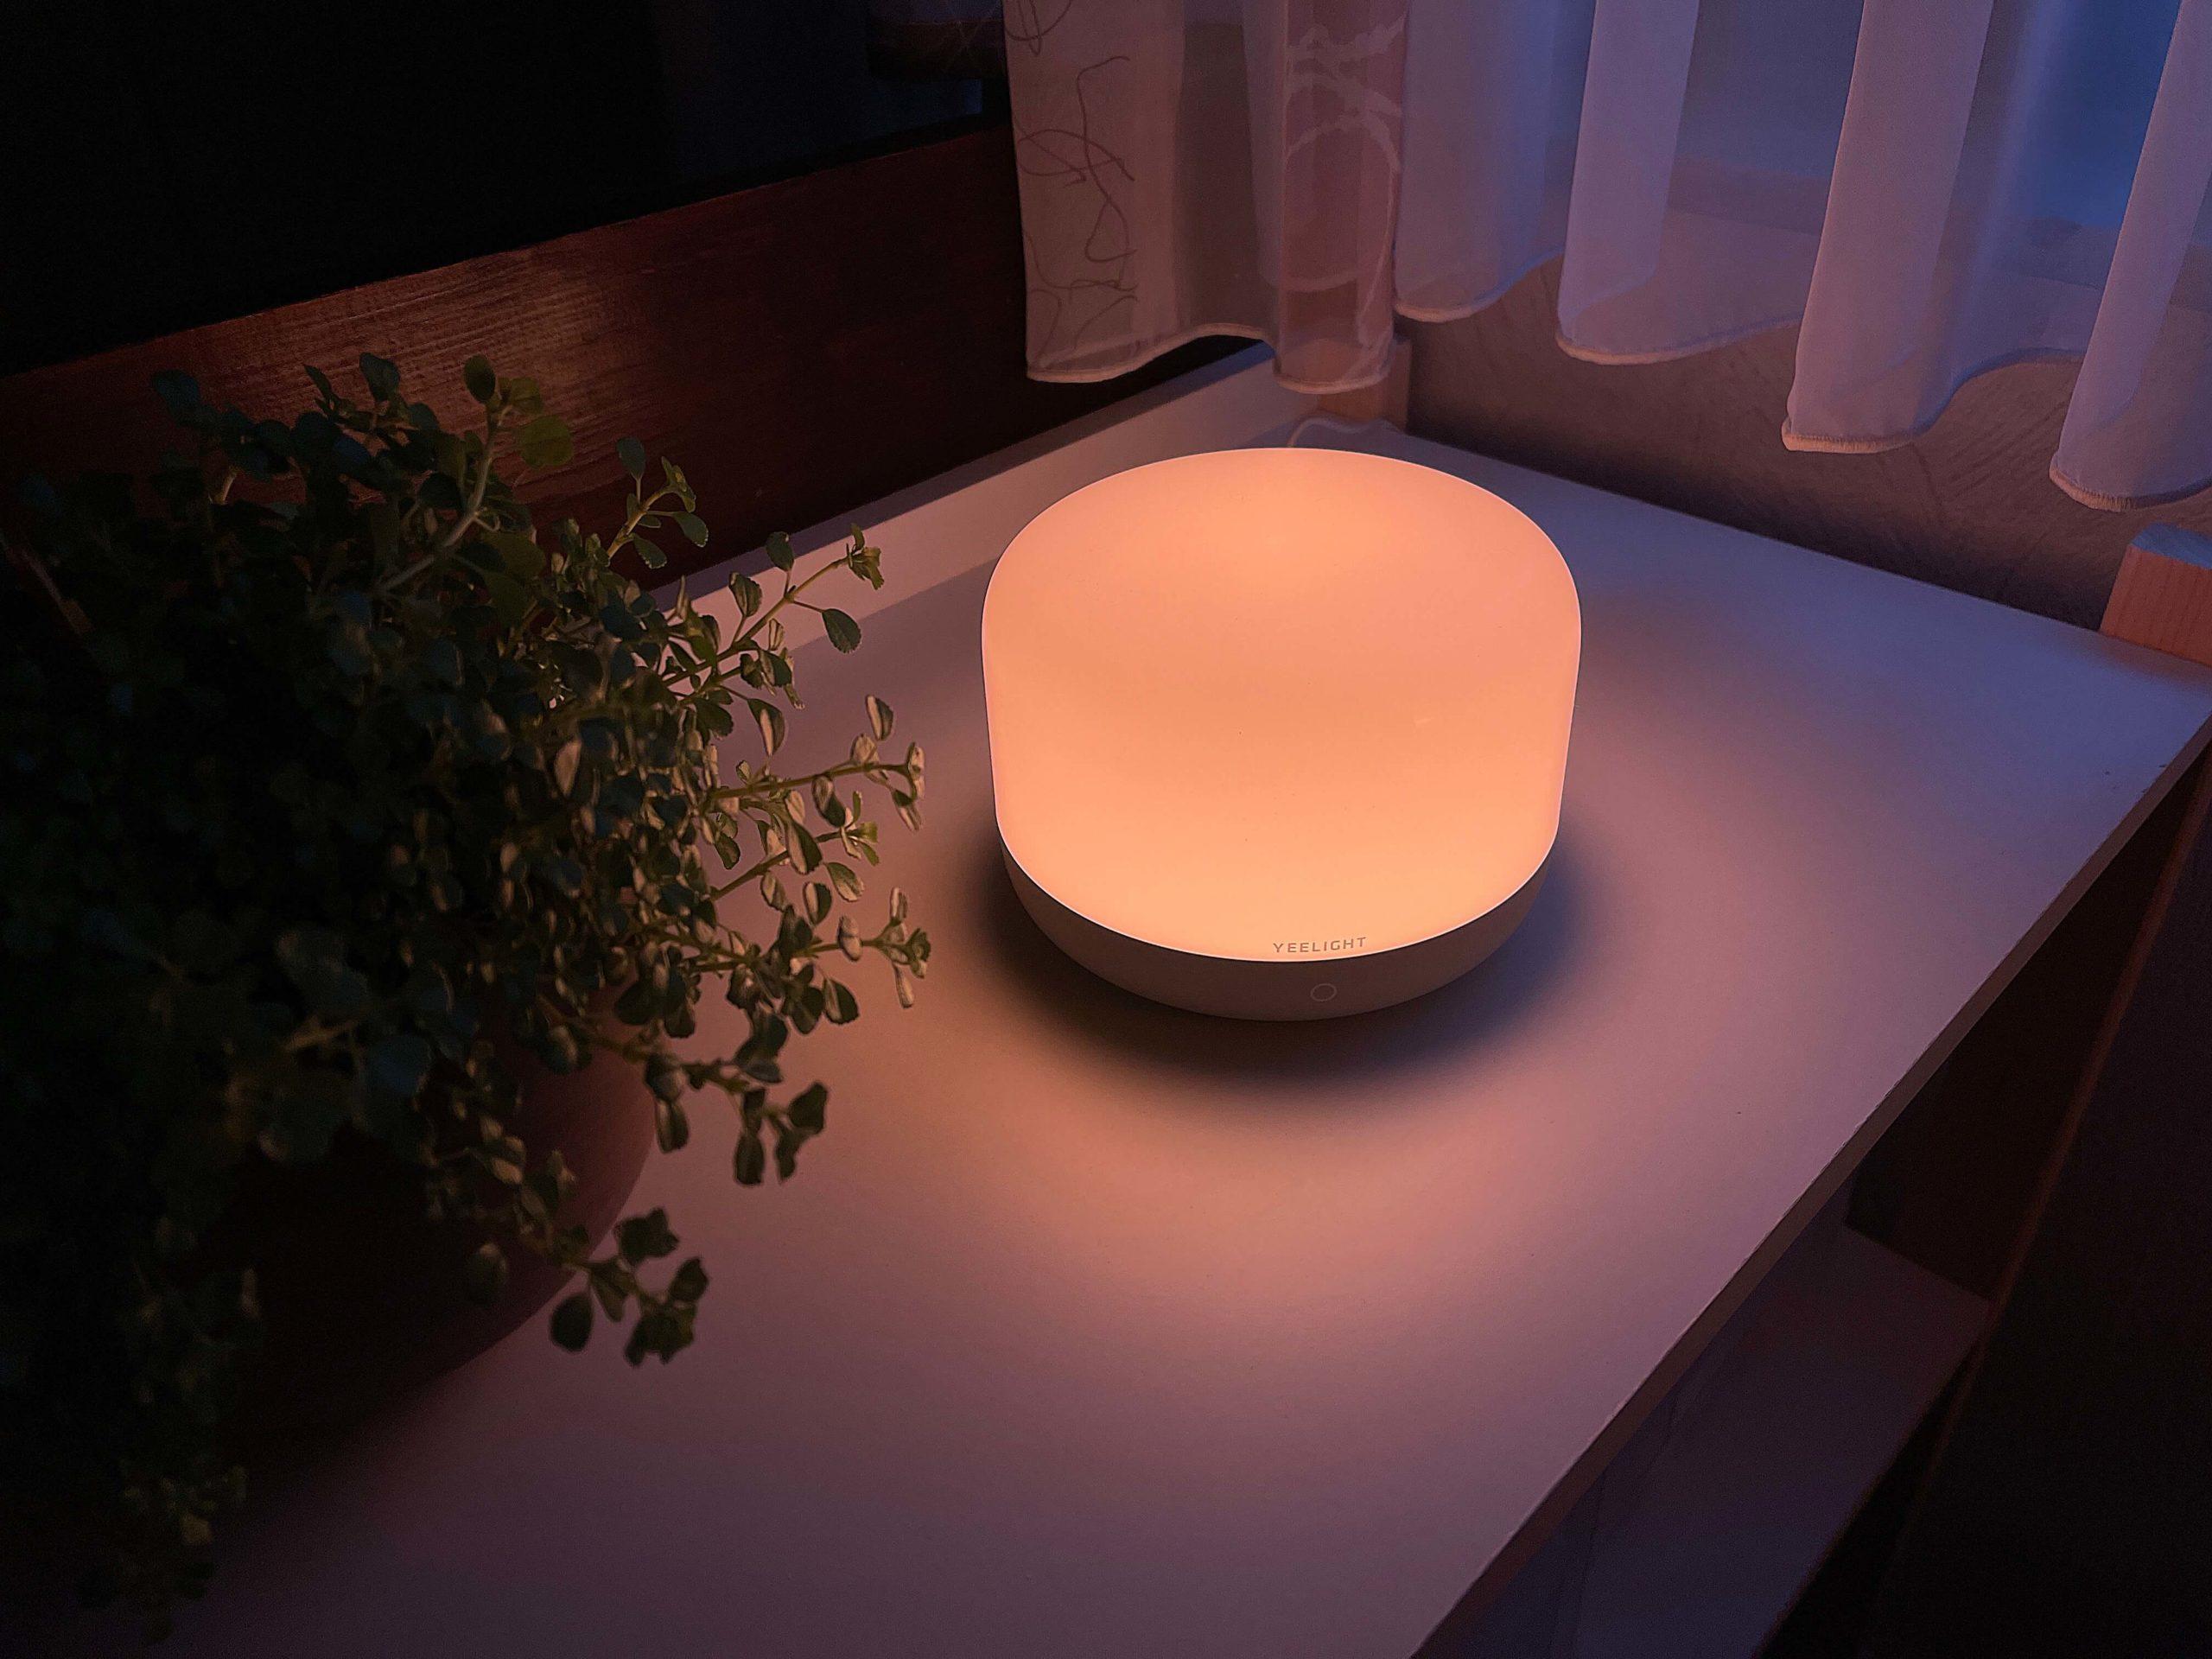 Apple-HomeKit-Nachttischlampe-D2-von-Yeelight4-scaled Nachttischlampe D2 von Yeelight mit Apple HomeKit